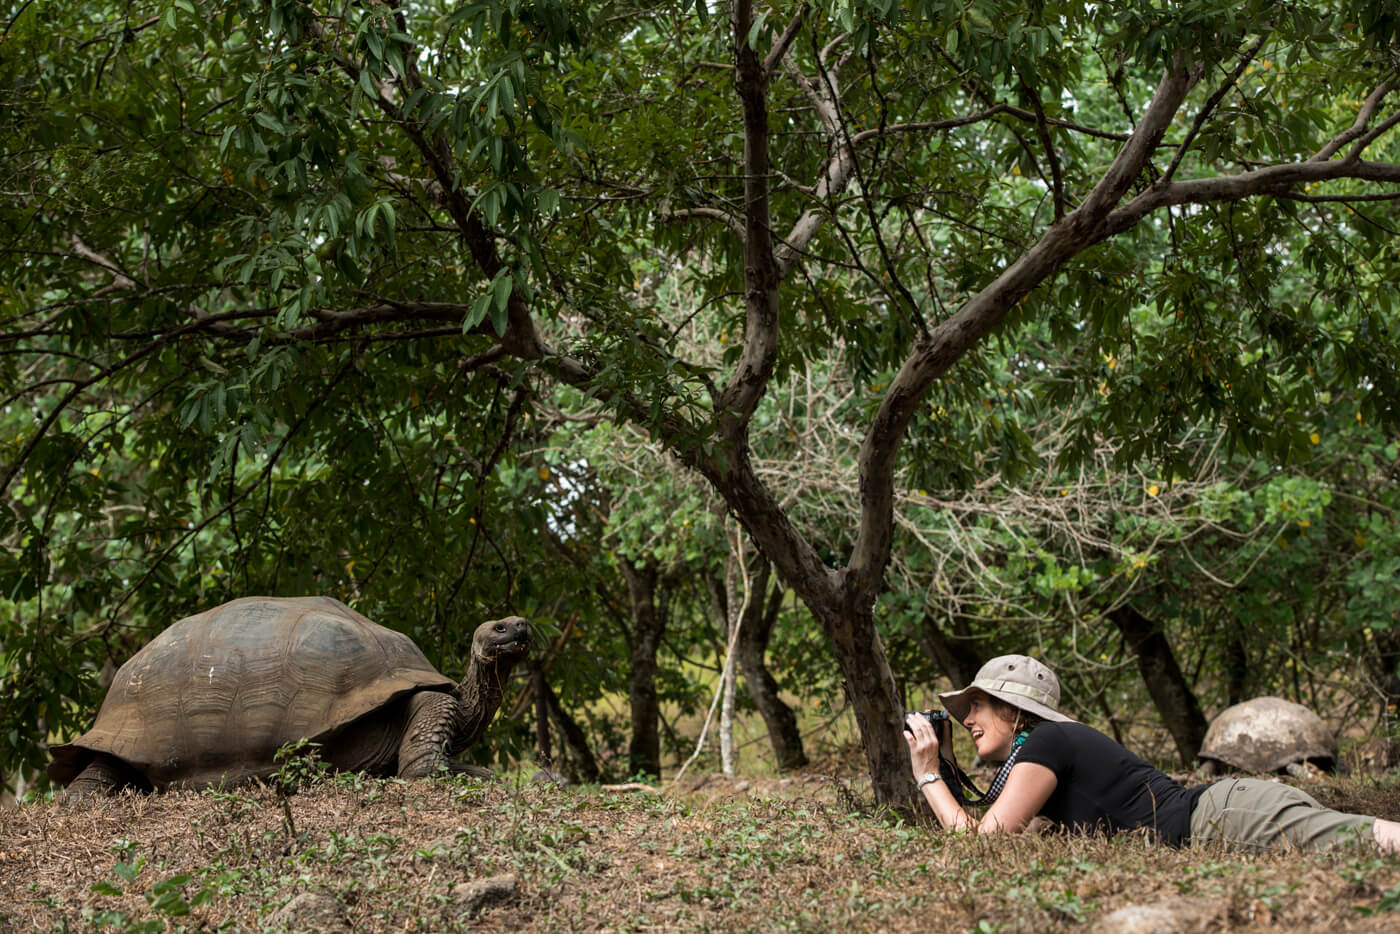 20160613_Model_with_Galapagos_Giant_Tortoise_386-web.jpg